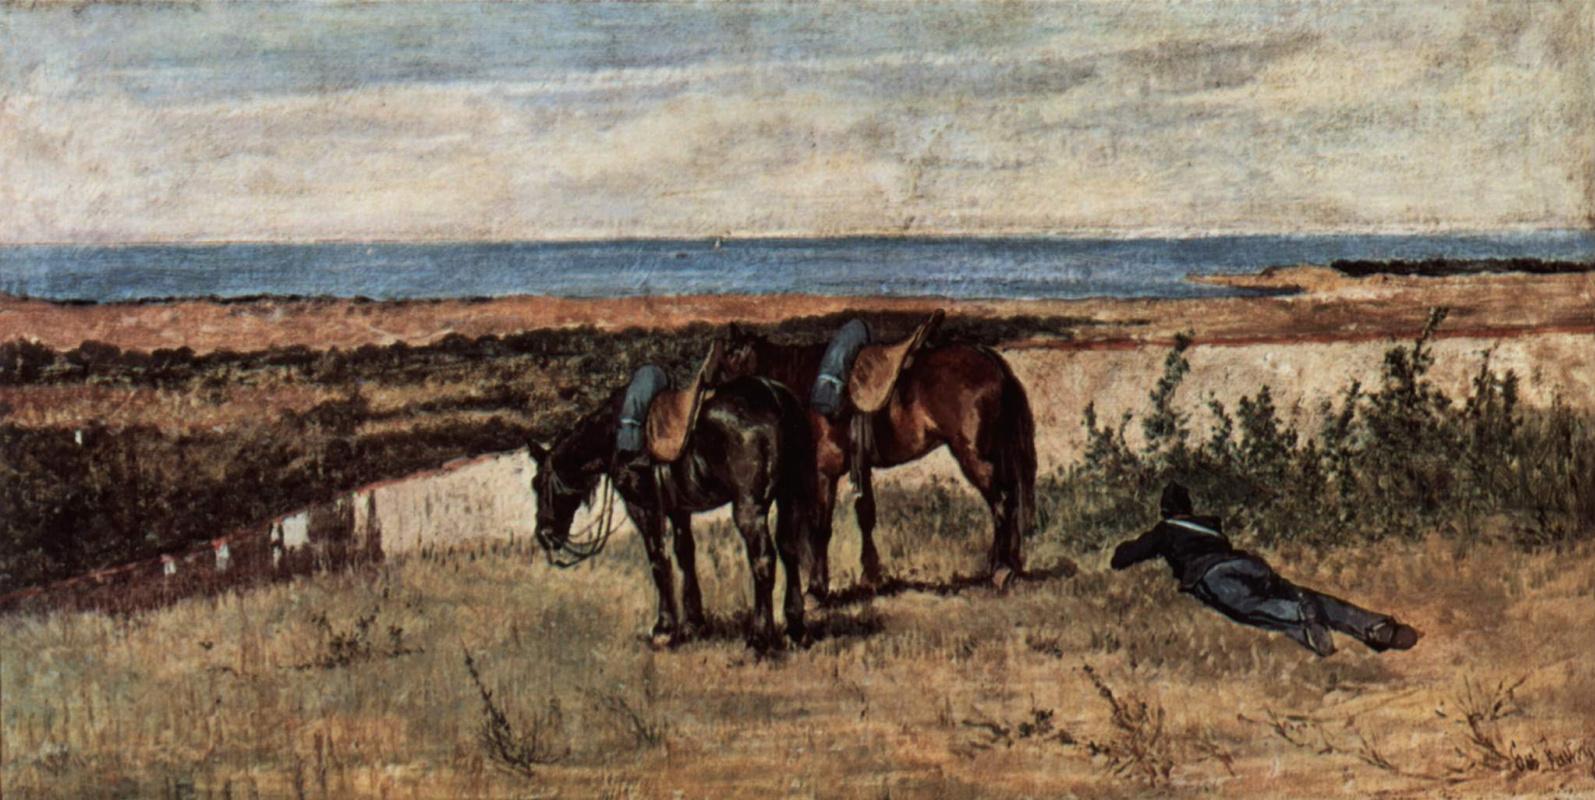 Giovanni Fattori. Soldier with two horses on the seashore